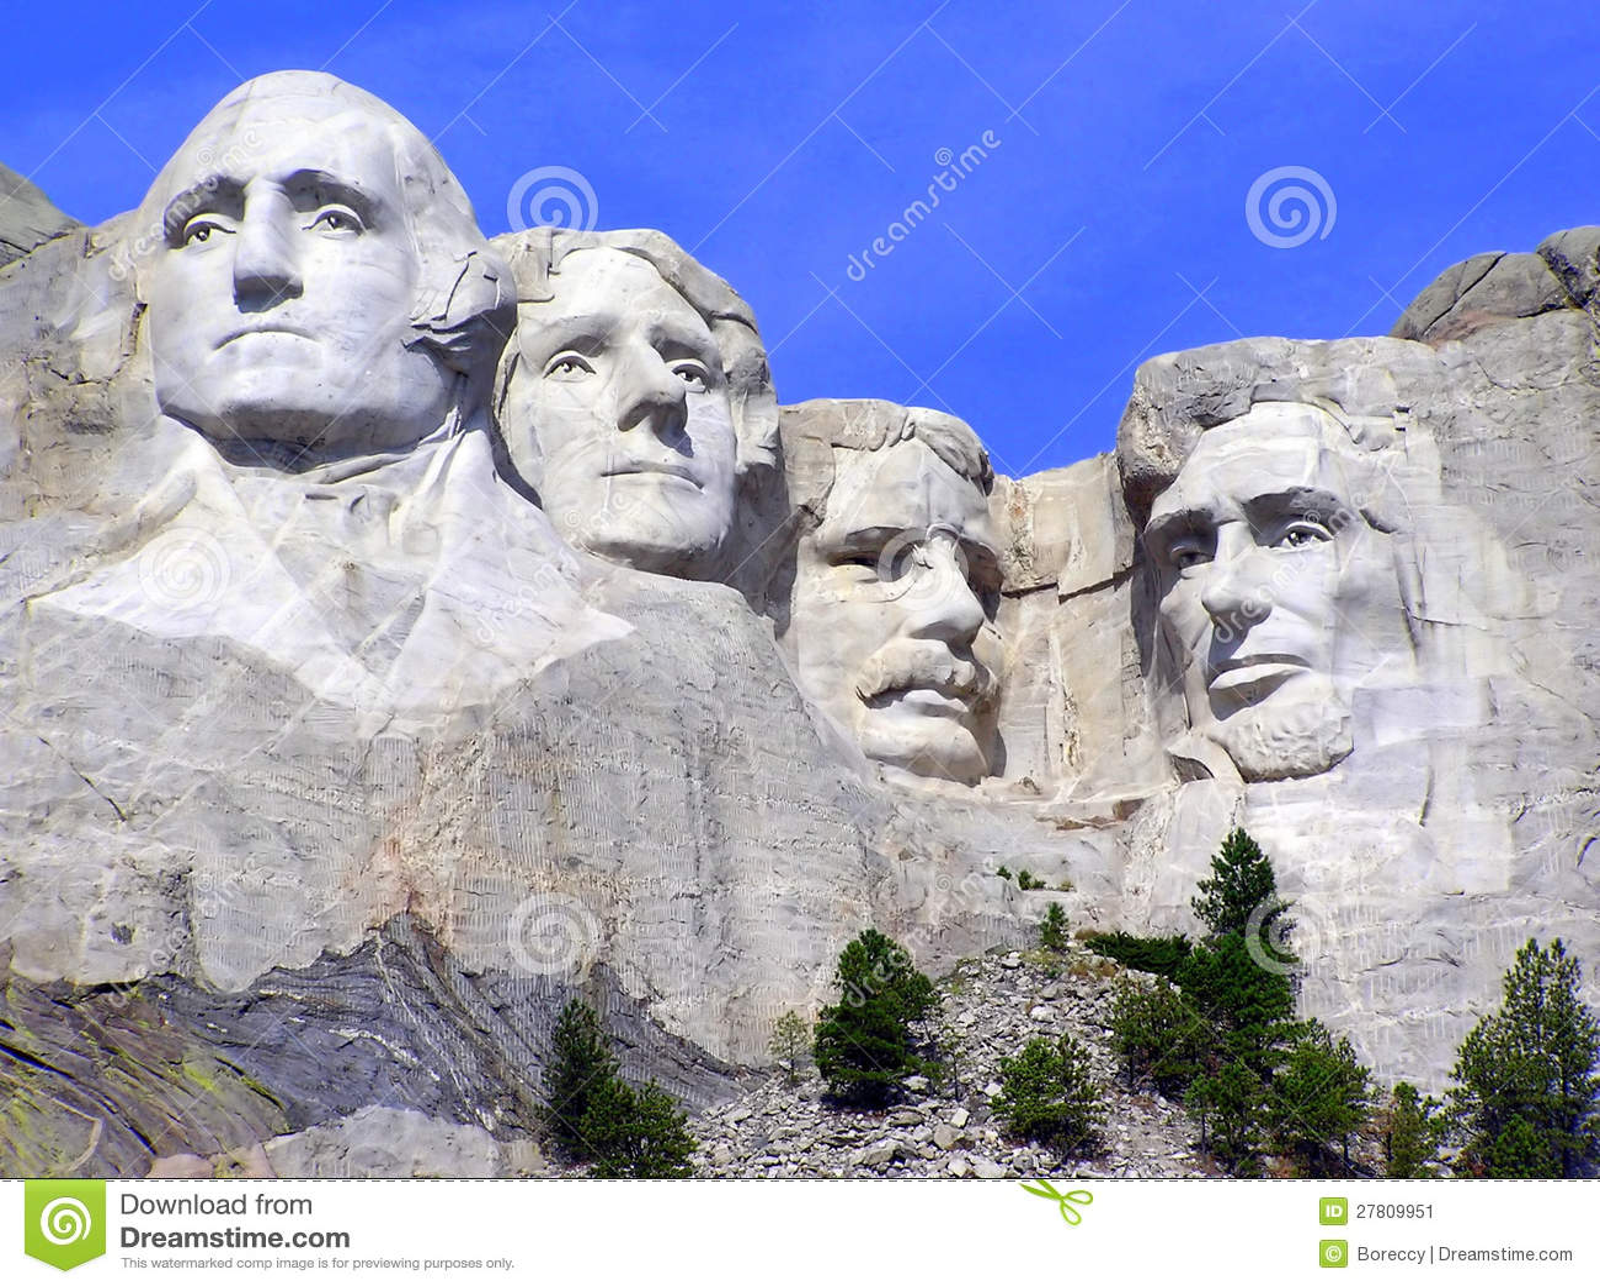 Mt. Rushmore eine Touristenattraktion in South Dakota